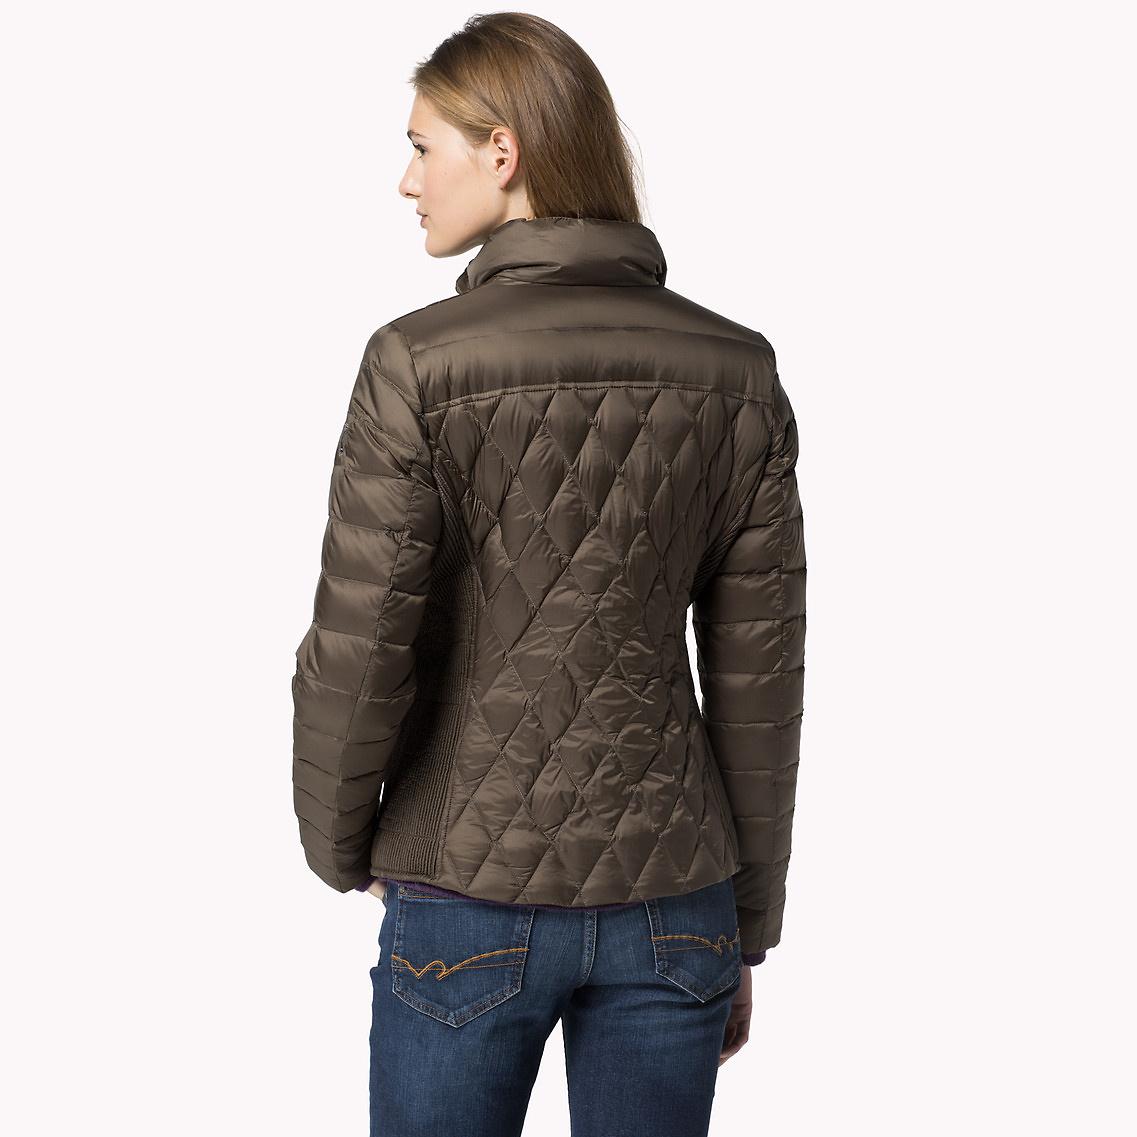 Tommy Hilfiger Nova Down Jacket in Brown - Lyst 1adde58161e